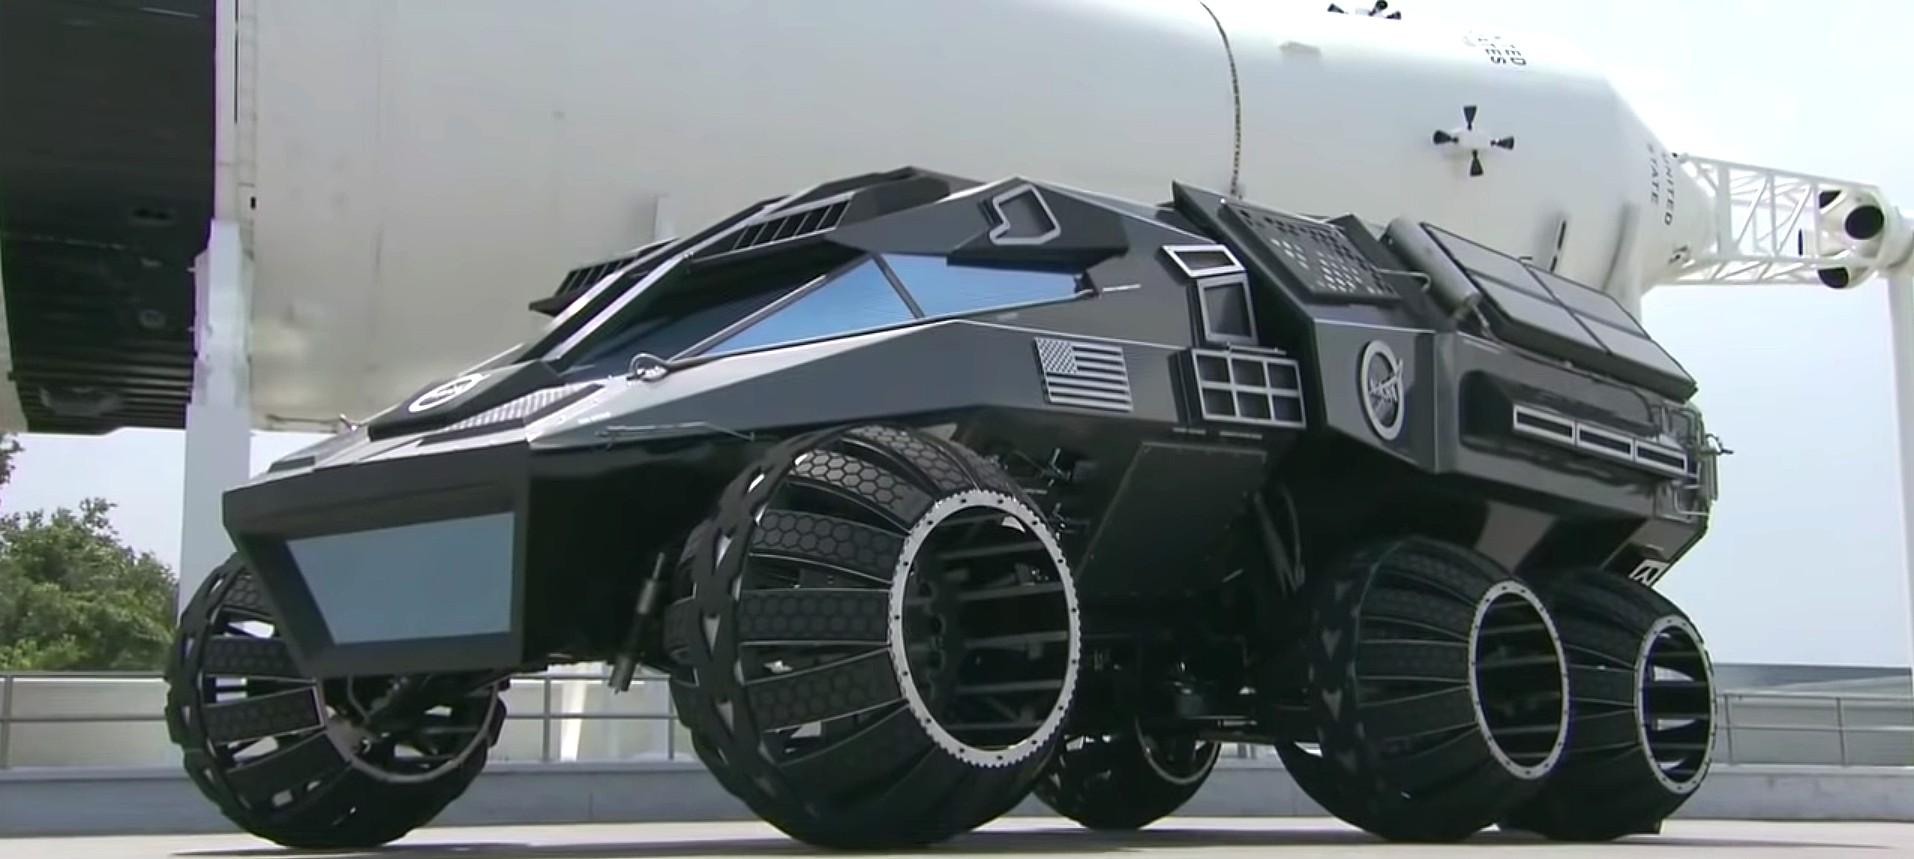 Tesla Cybertruck Sure Looks Similar To Nasa S Mars Rover